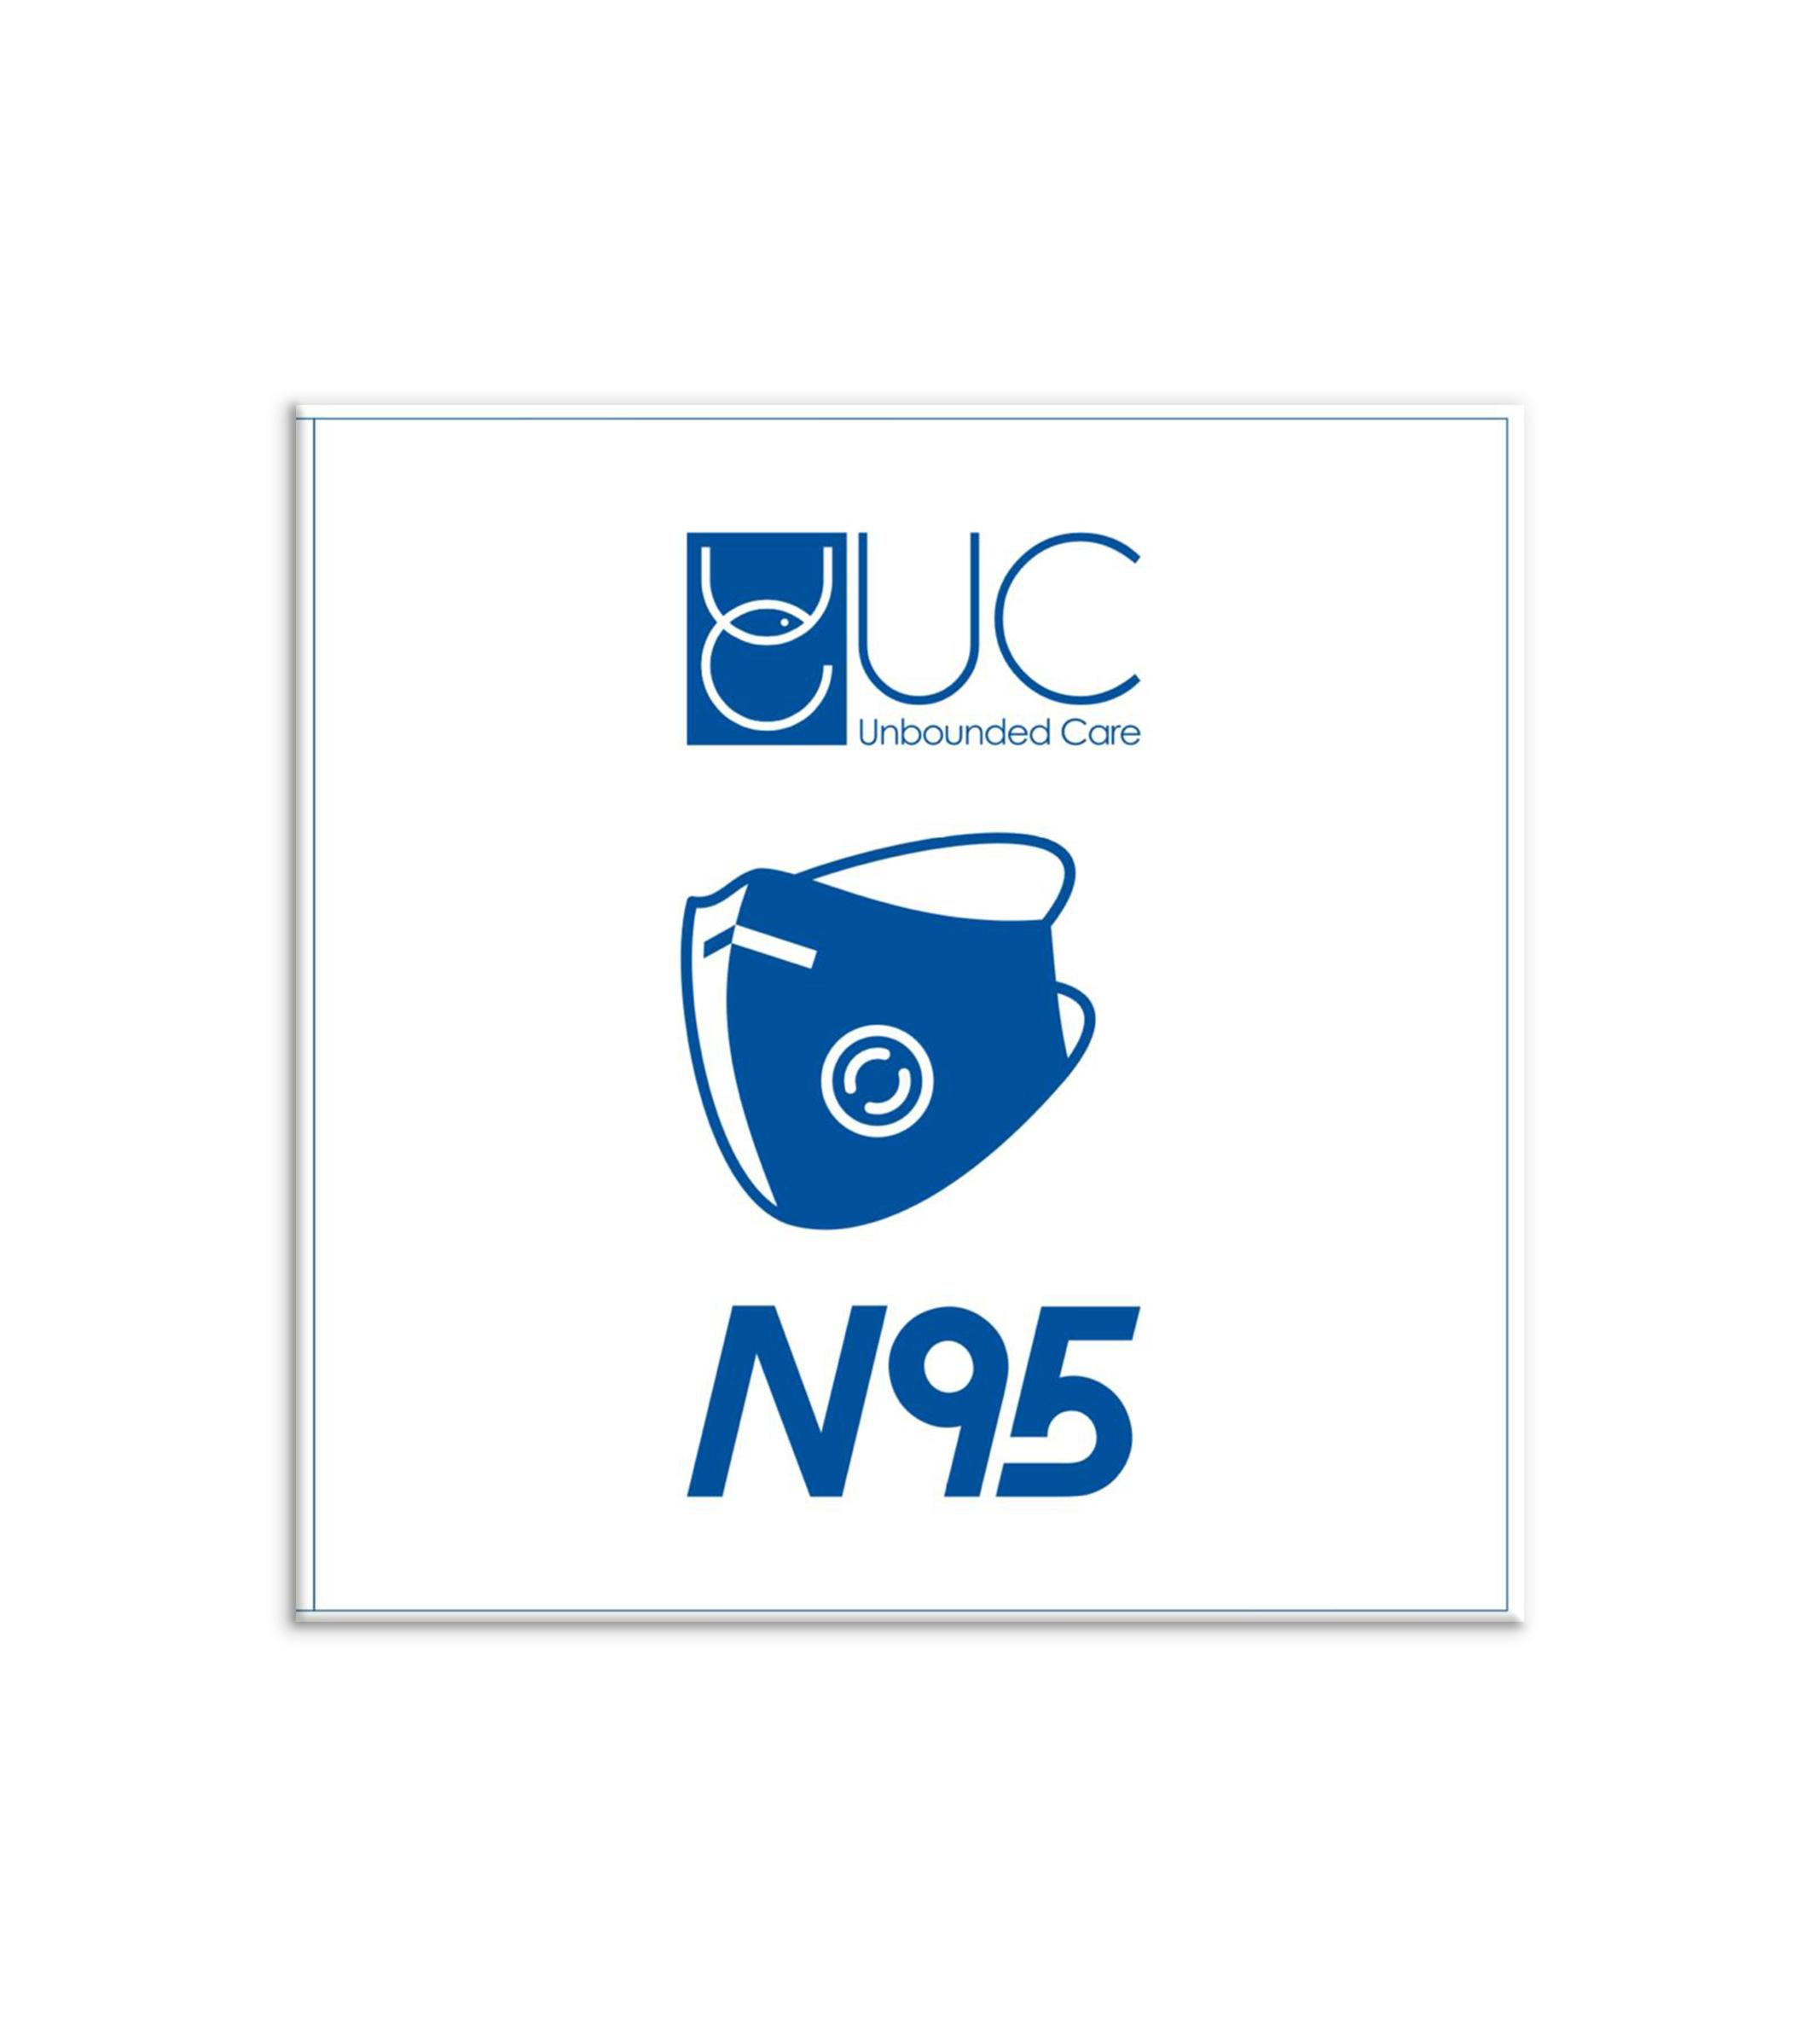 ماسک تنفسی  UC N95 مدل HY8222 FFP2 کارتن 300 عددی